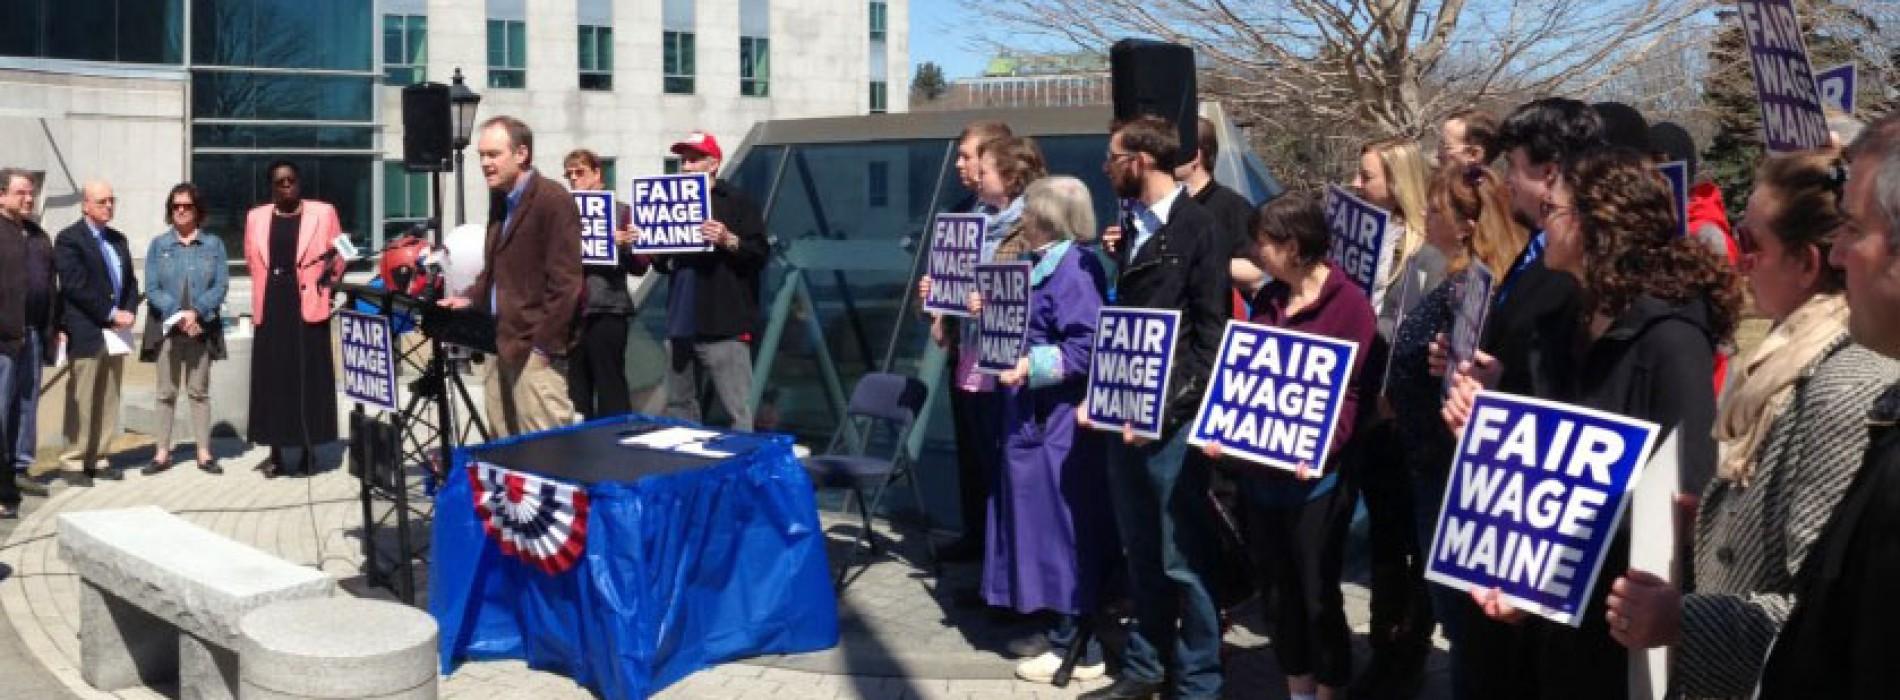 These Maine Representatives stood up for raising the minimum wage